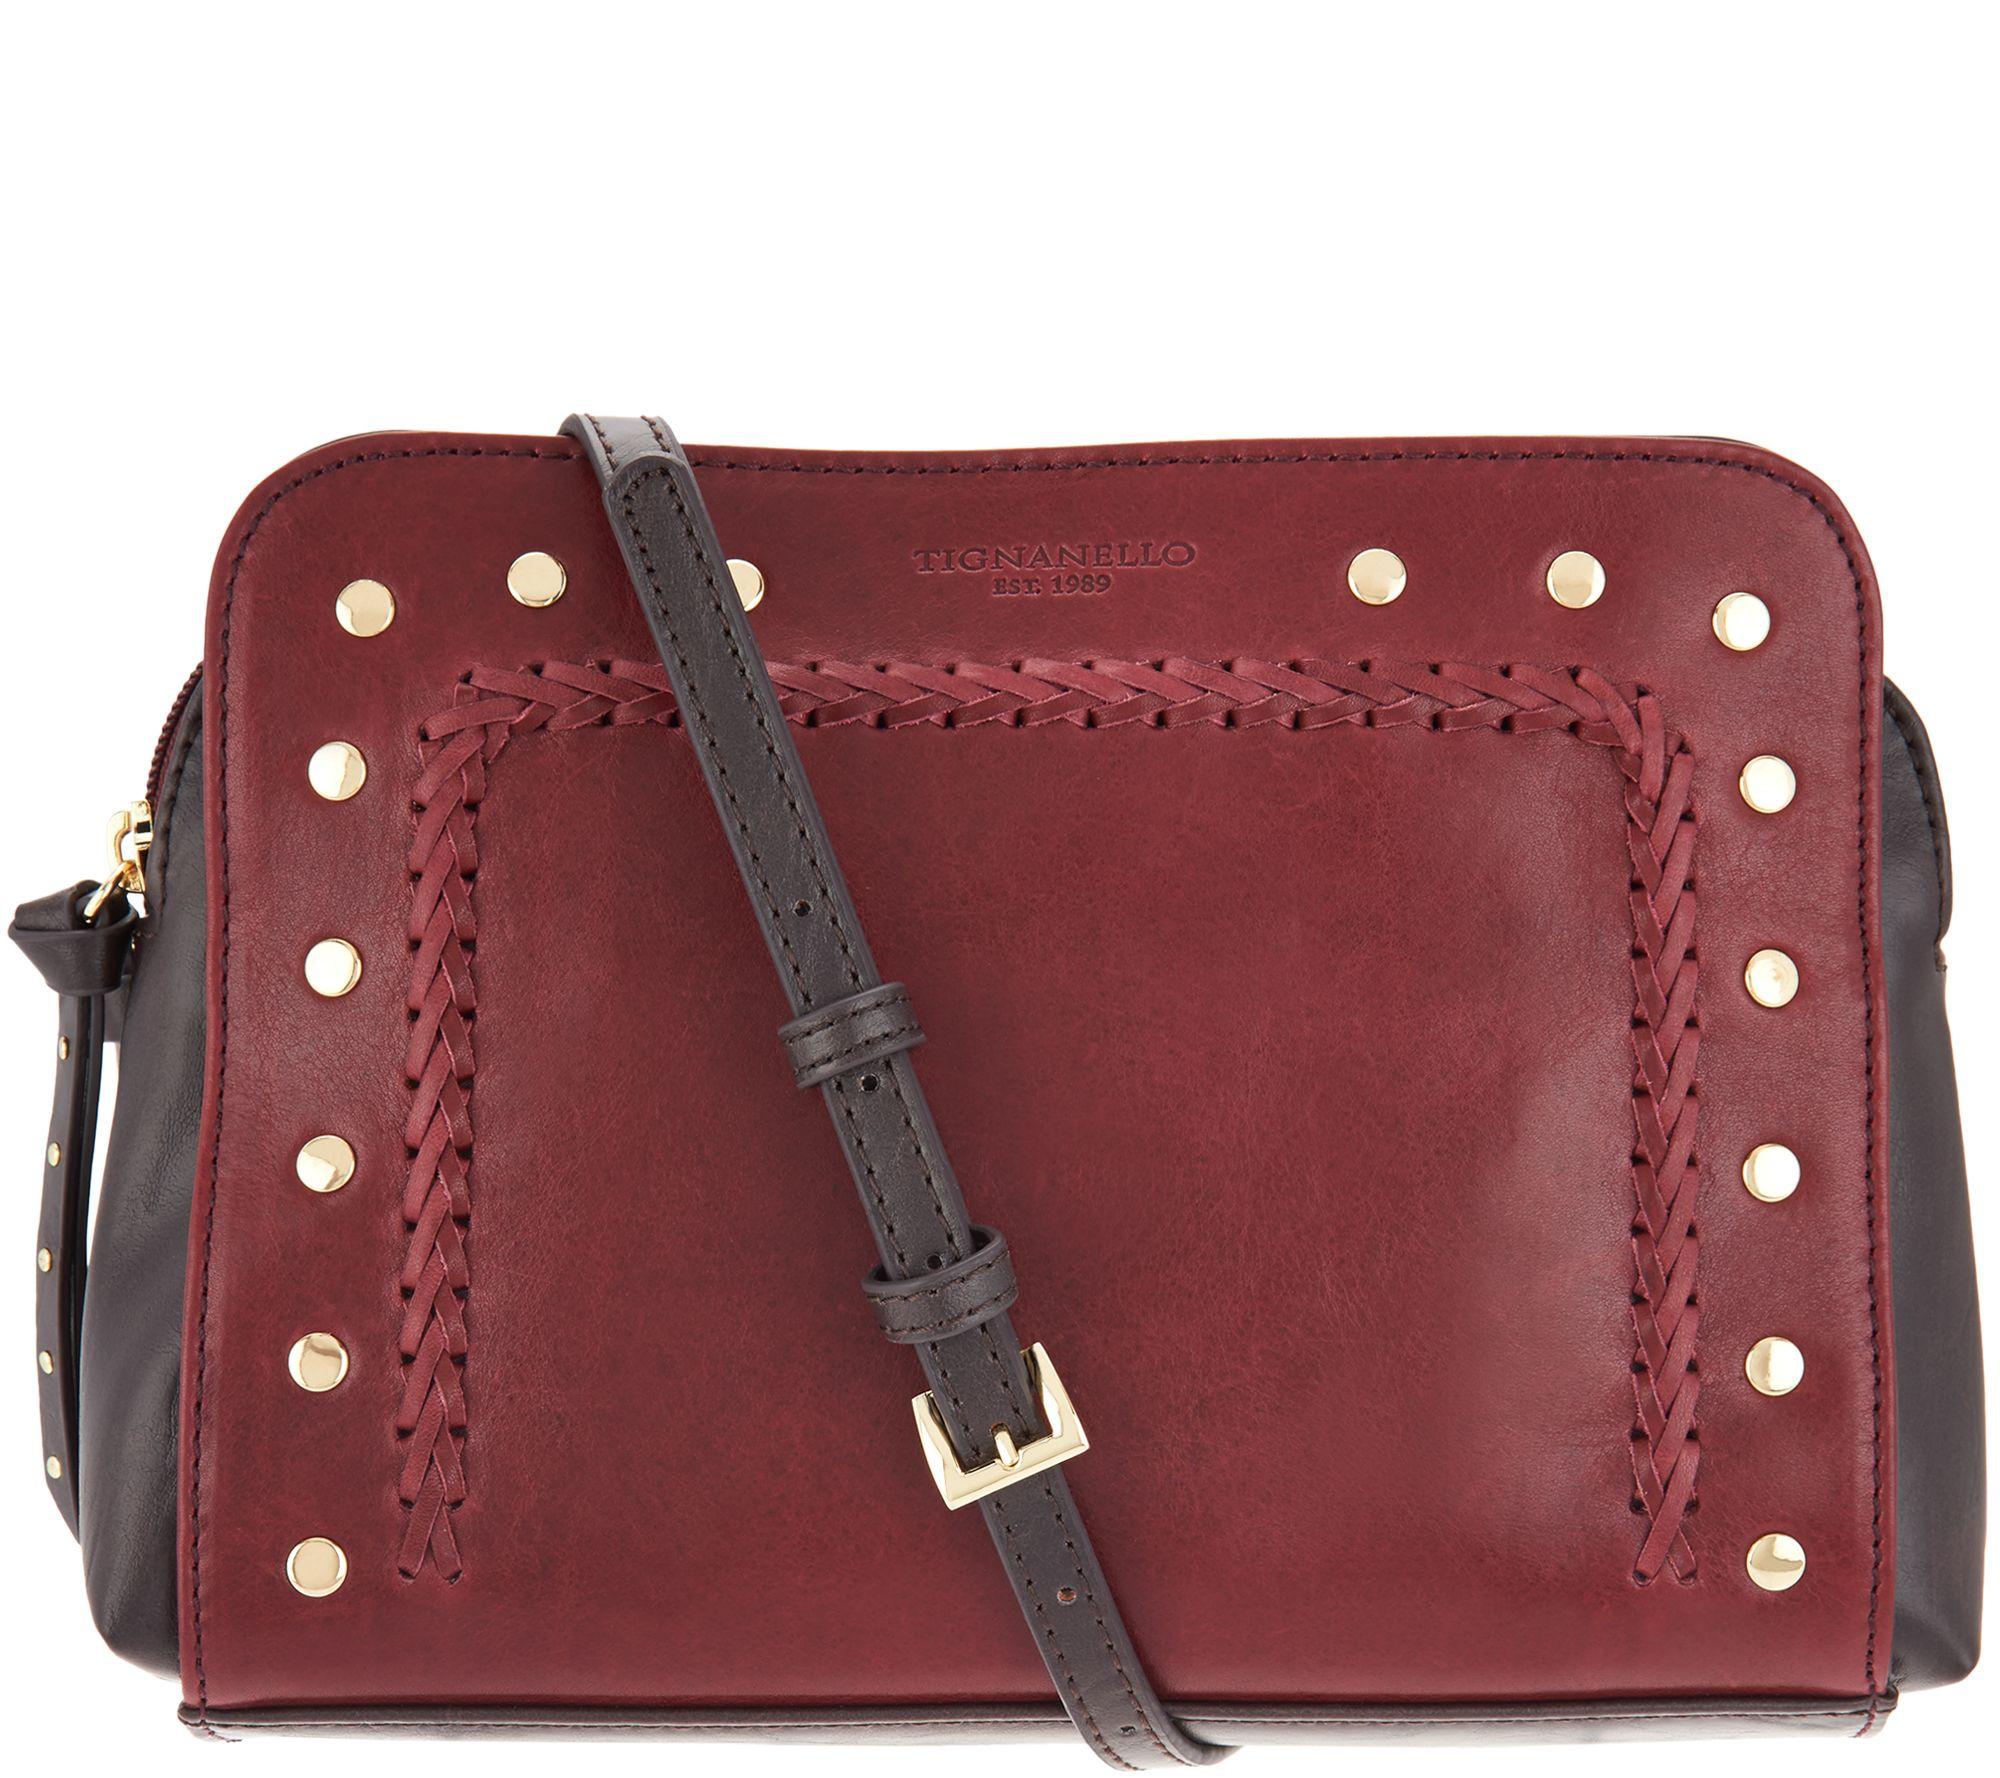 daec2e89cf Tignanello Vintage Leather Mojave Crossbody Handbag - Page 1 — QVC.com